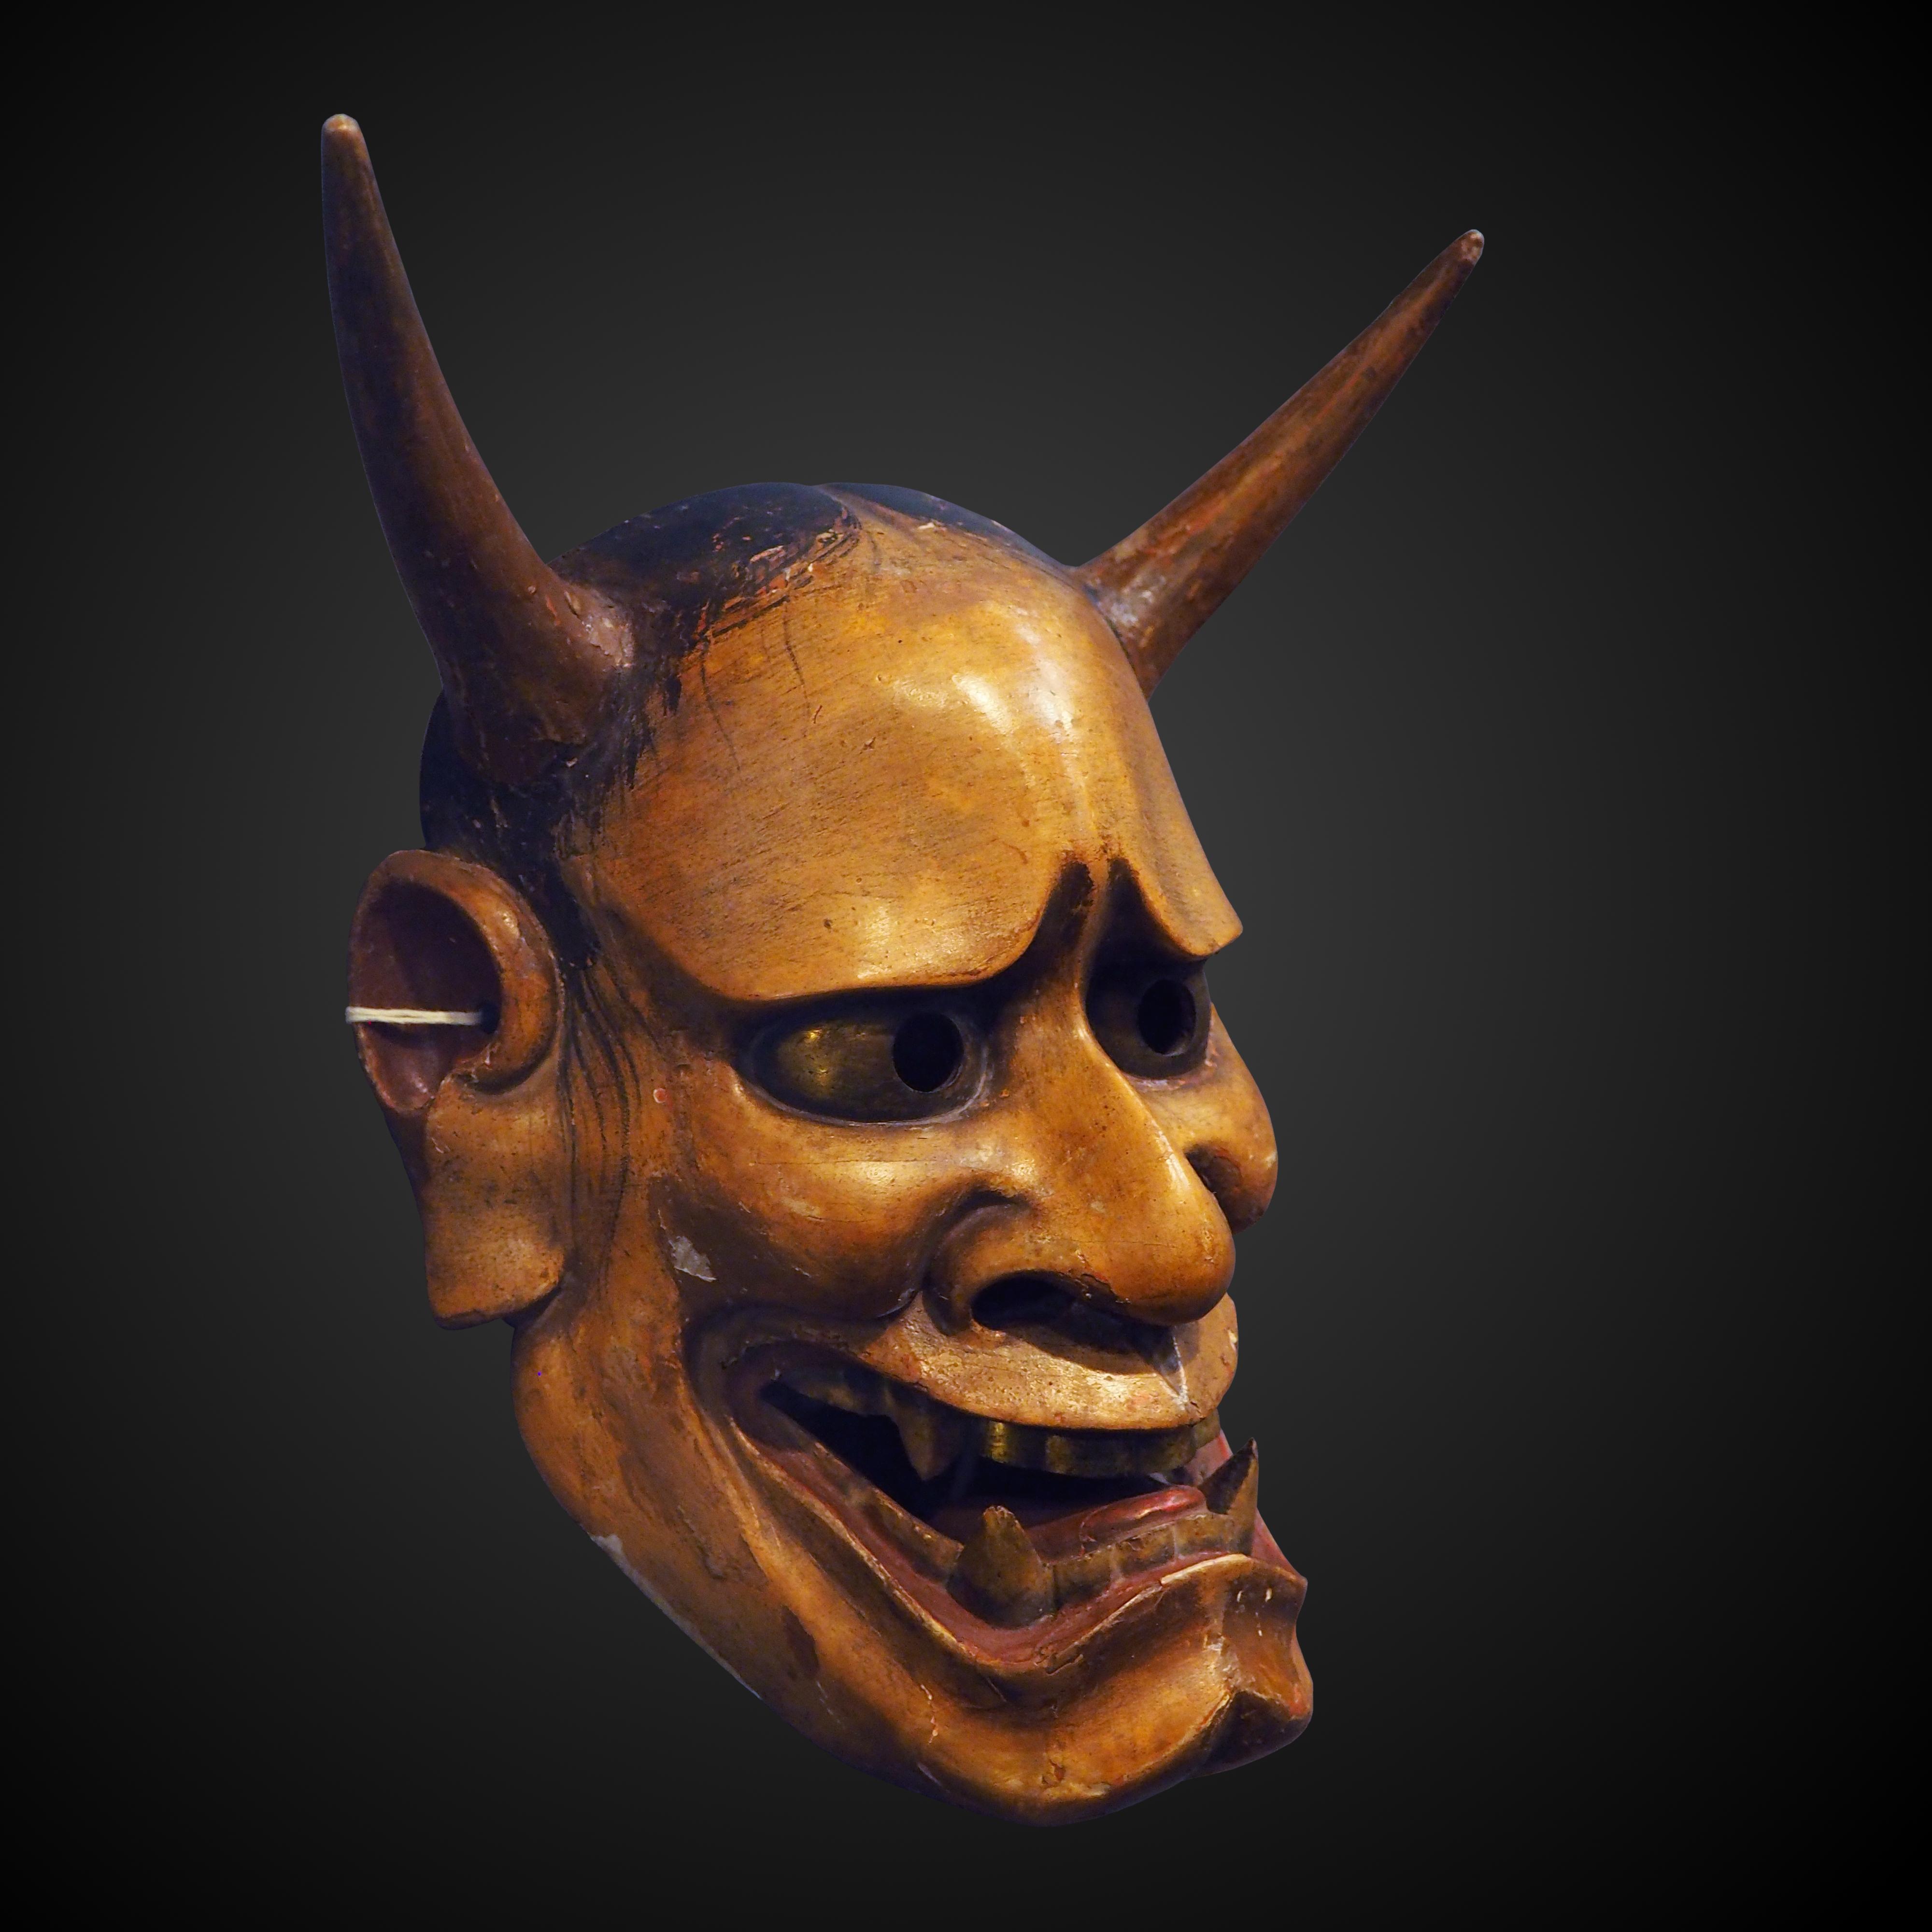 Hannya no mask-Ethno BHM 1946.266.4828-P6141137-gradient.jpg